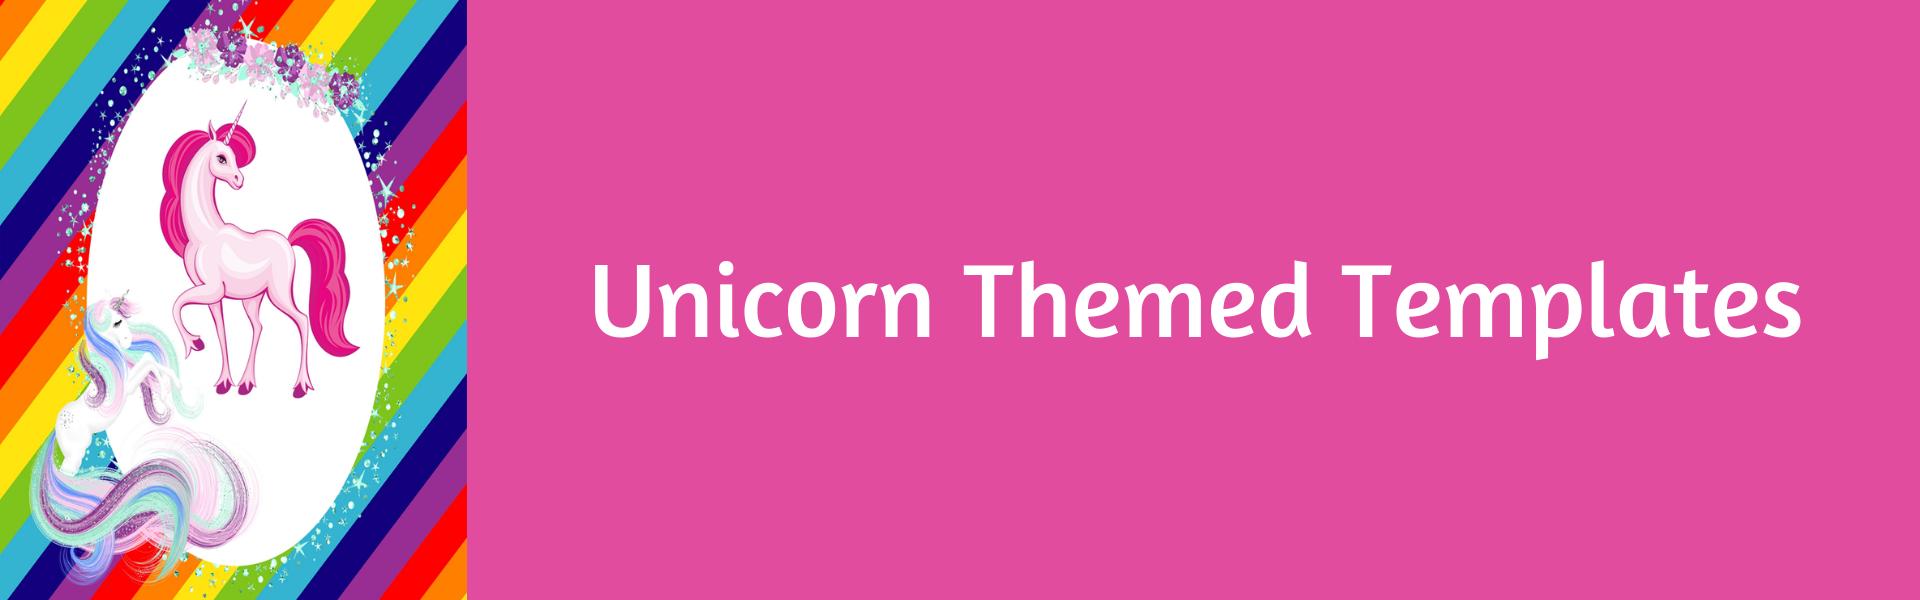 Unicorn Themed Templates